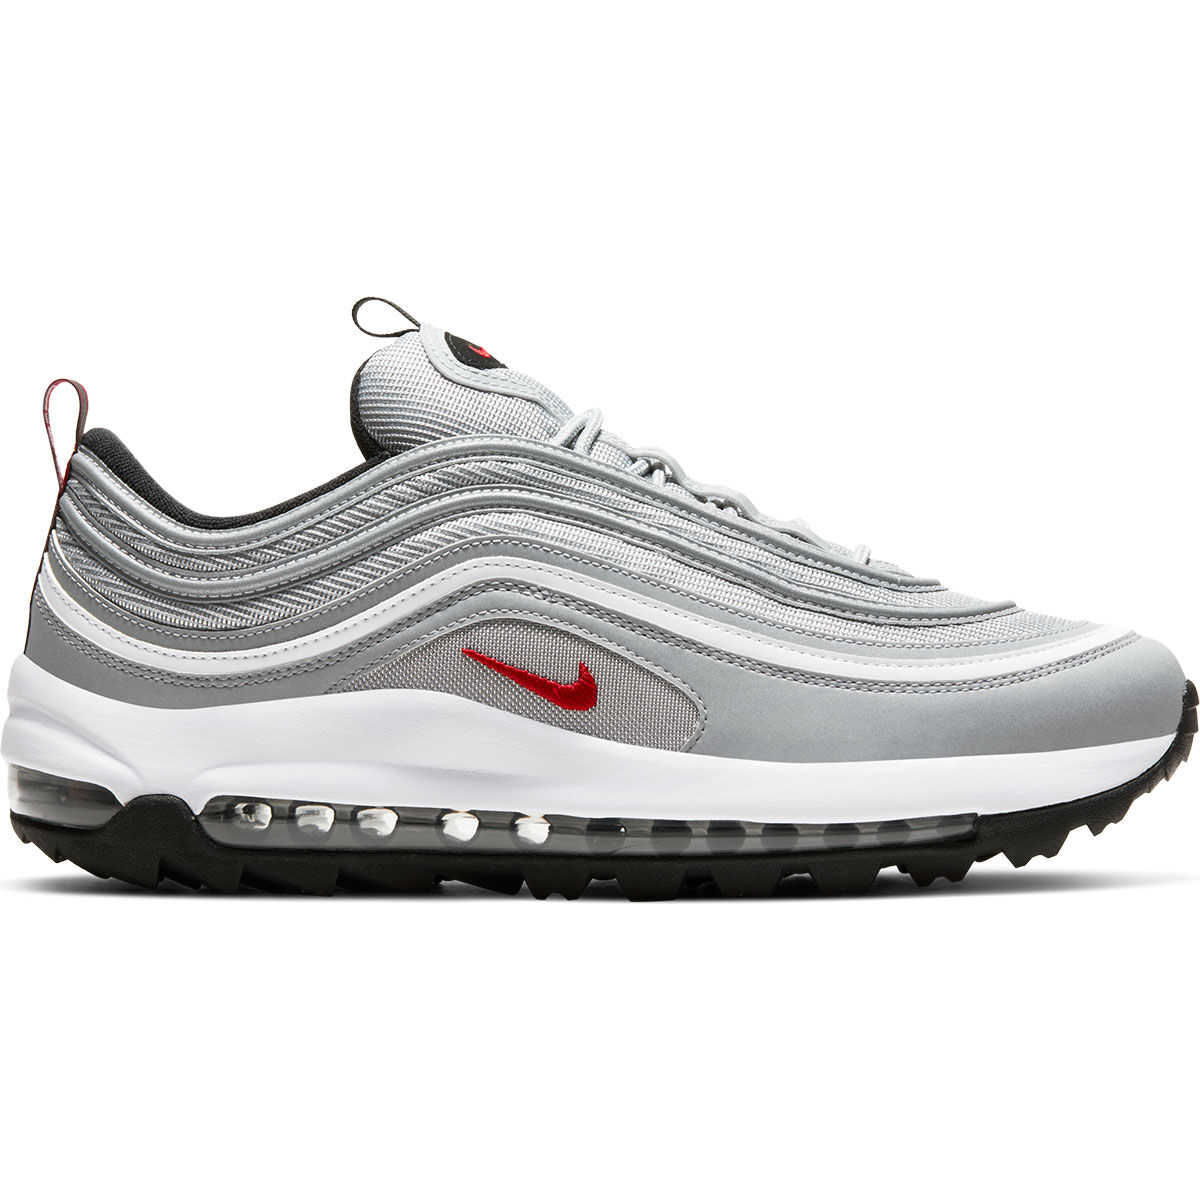 Chaussures Nike Golf Air Max 97 G | Online Golf